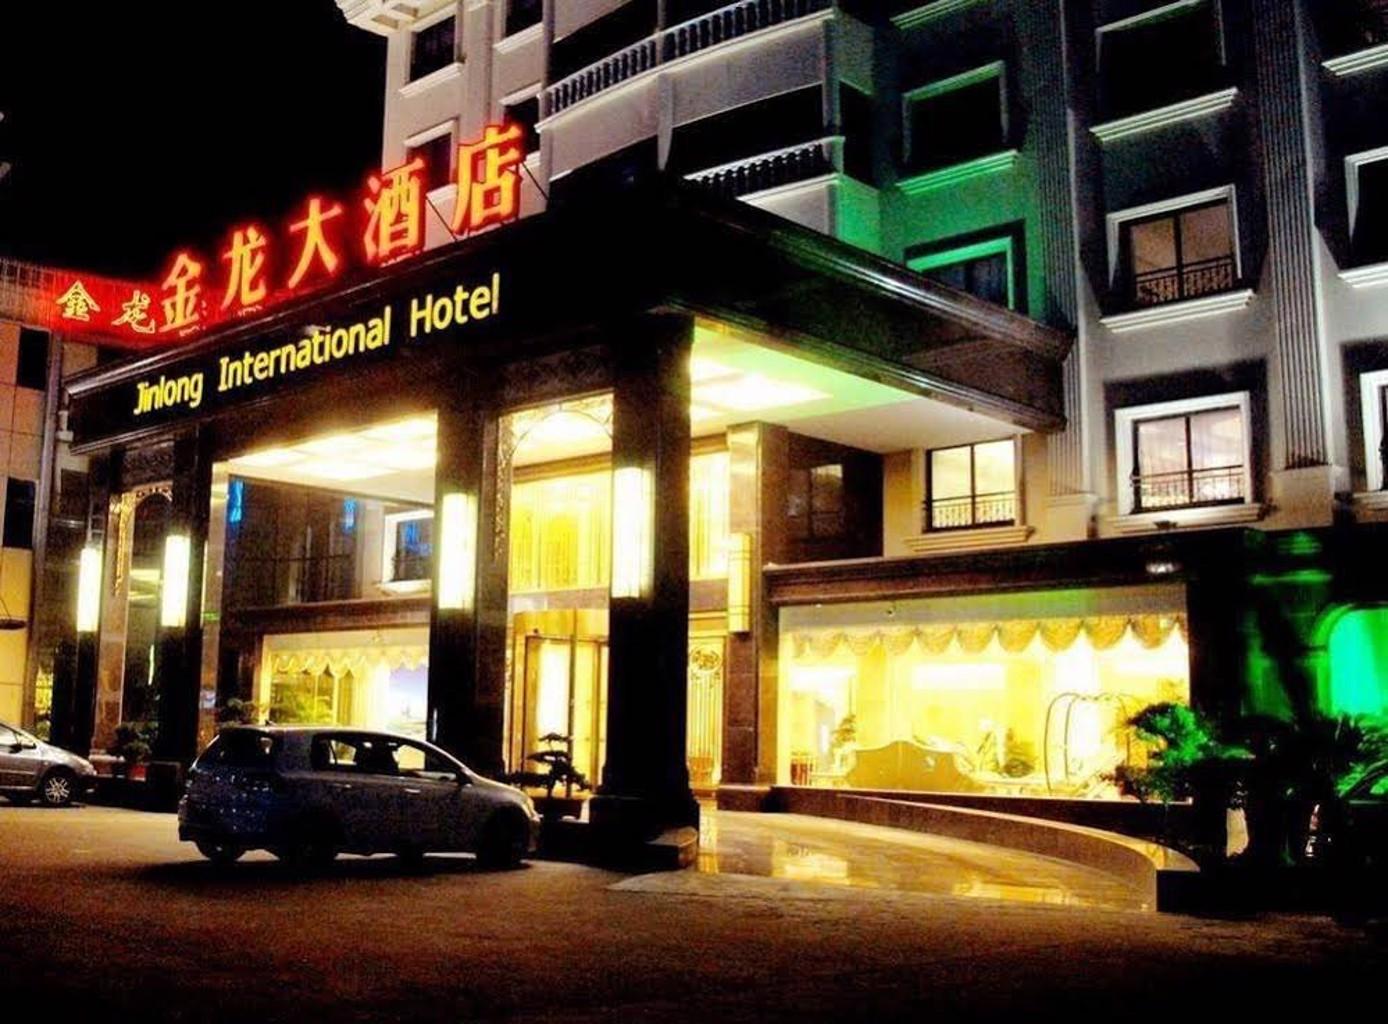 Jin Long Hotel